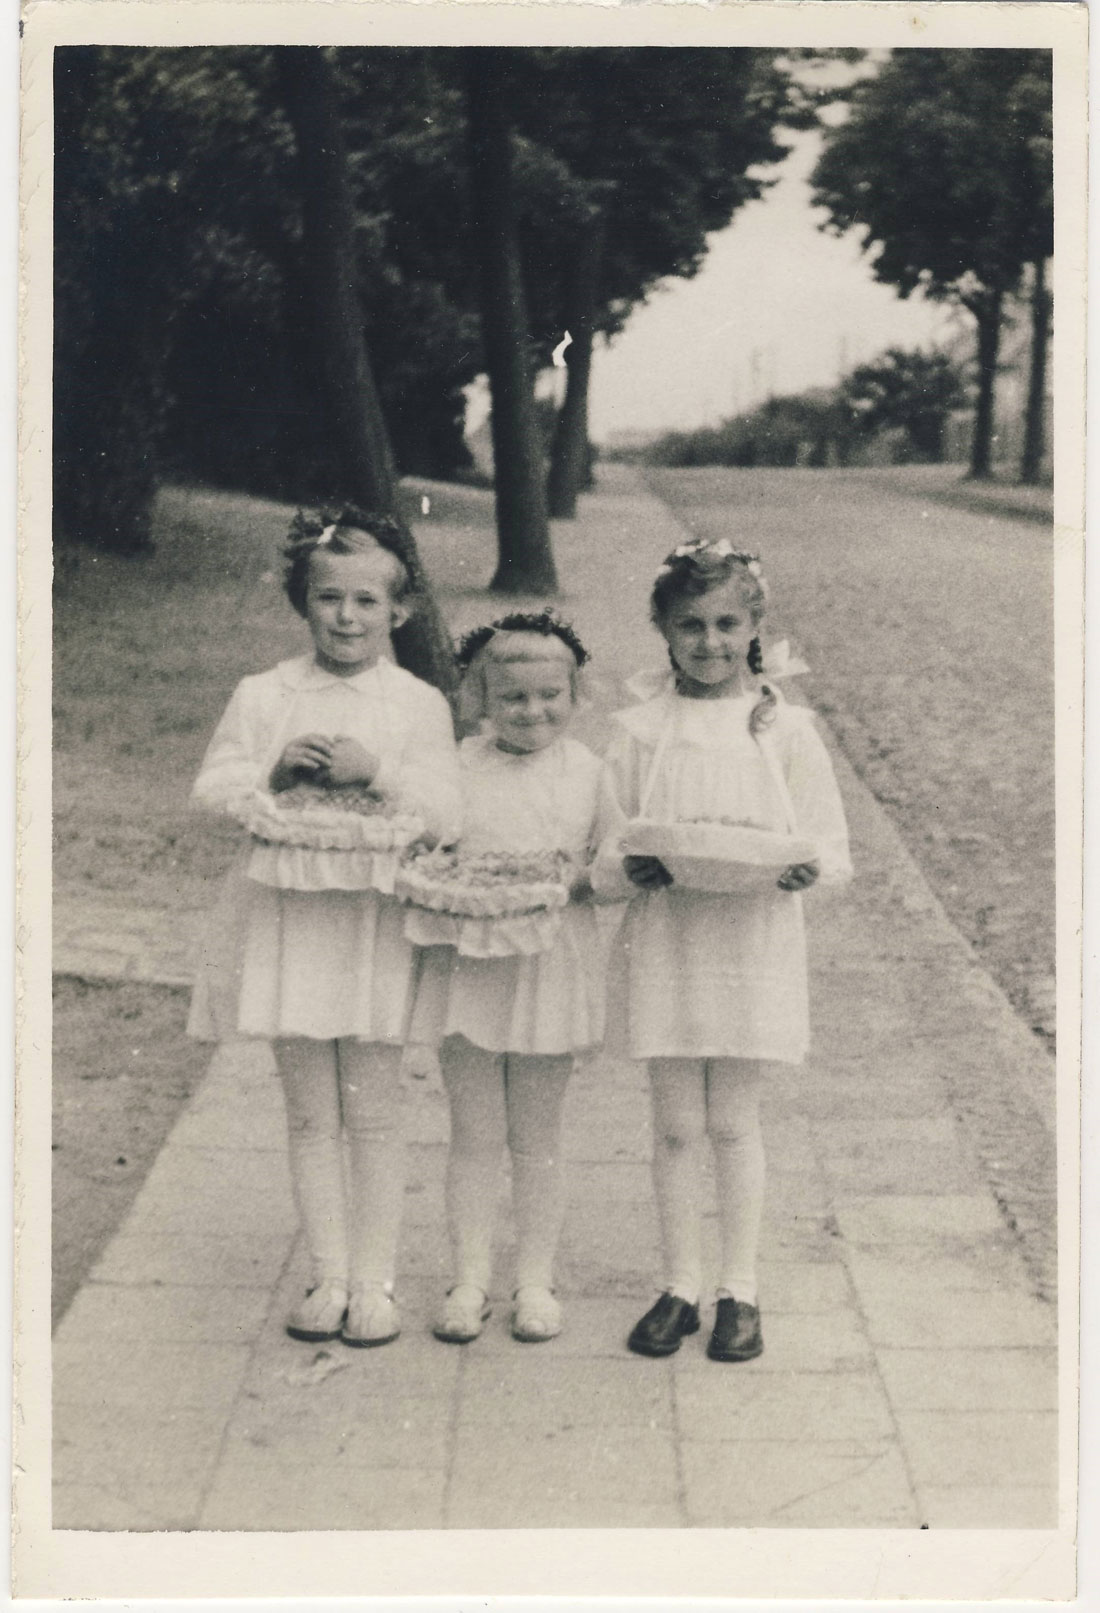 ulica Dworcowa Kórnik - 1961